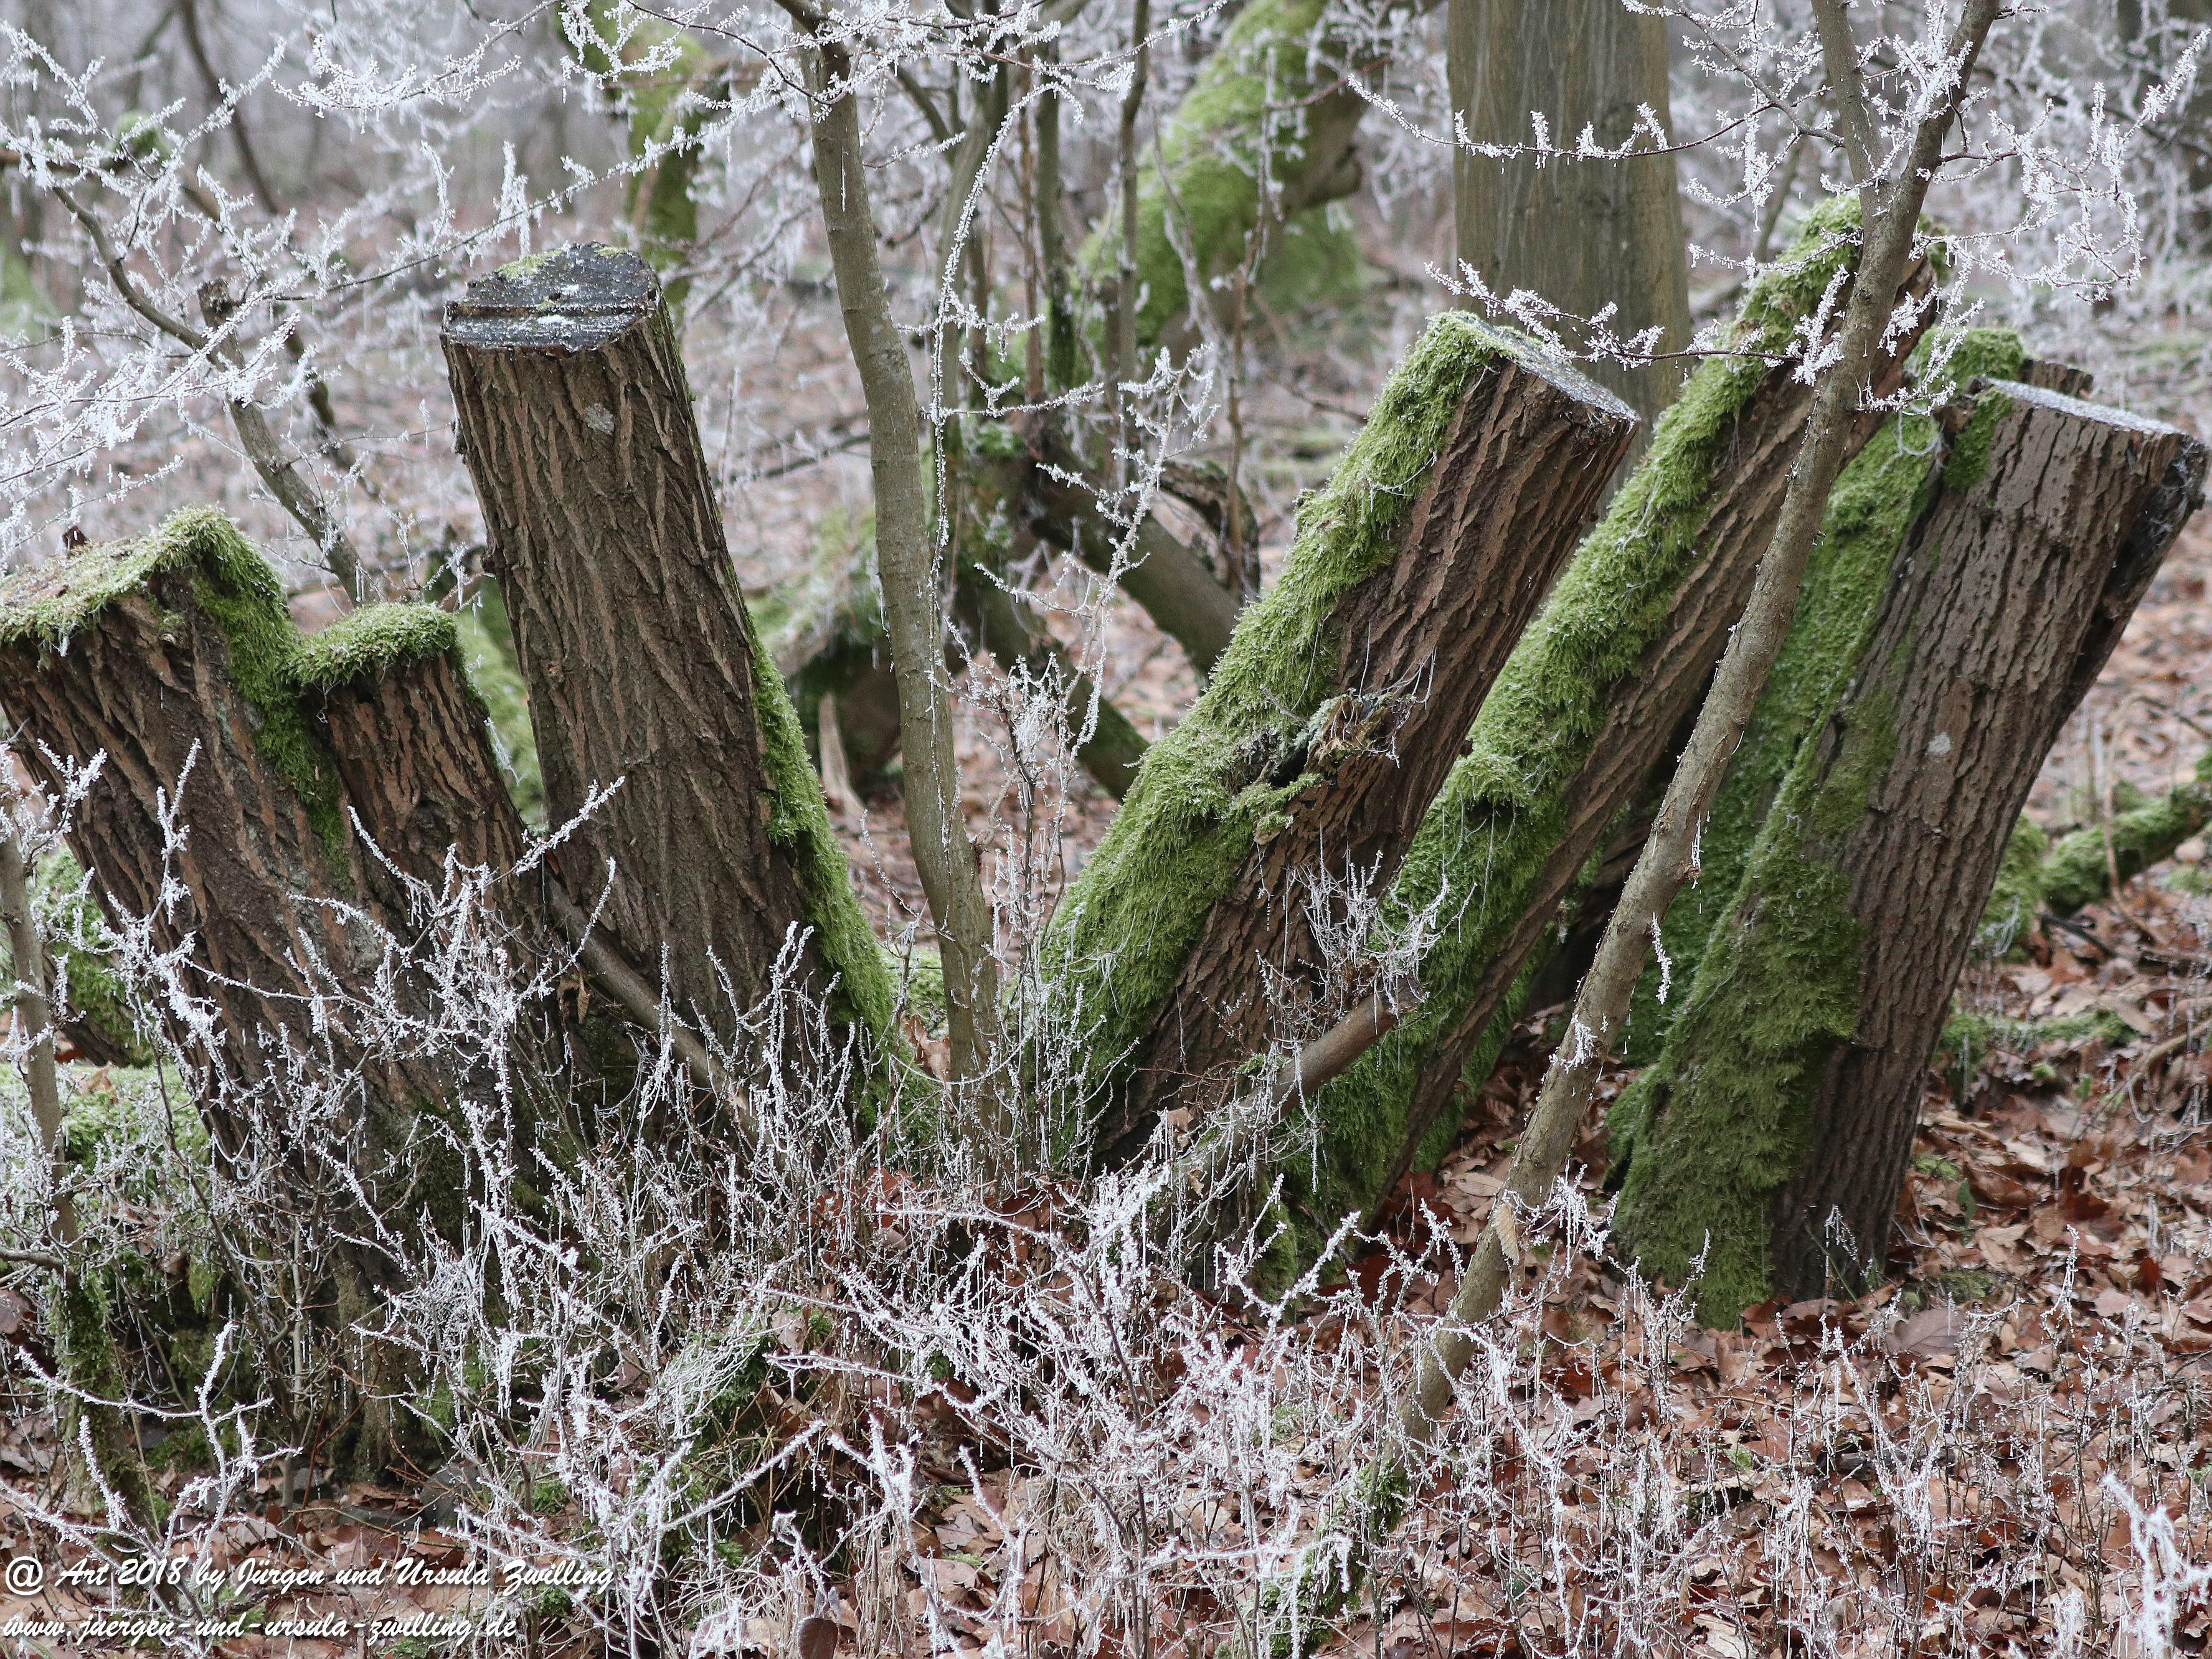 Winterbaumstämme